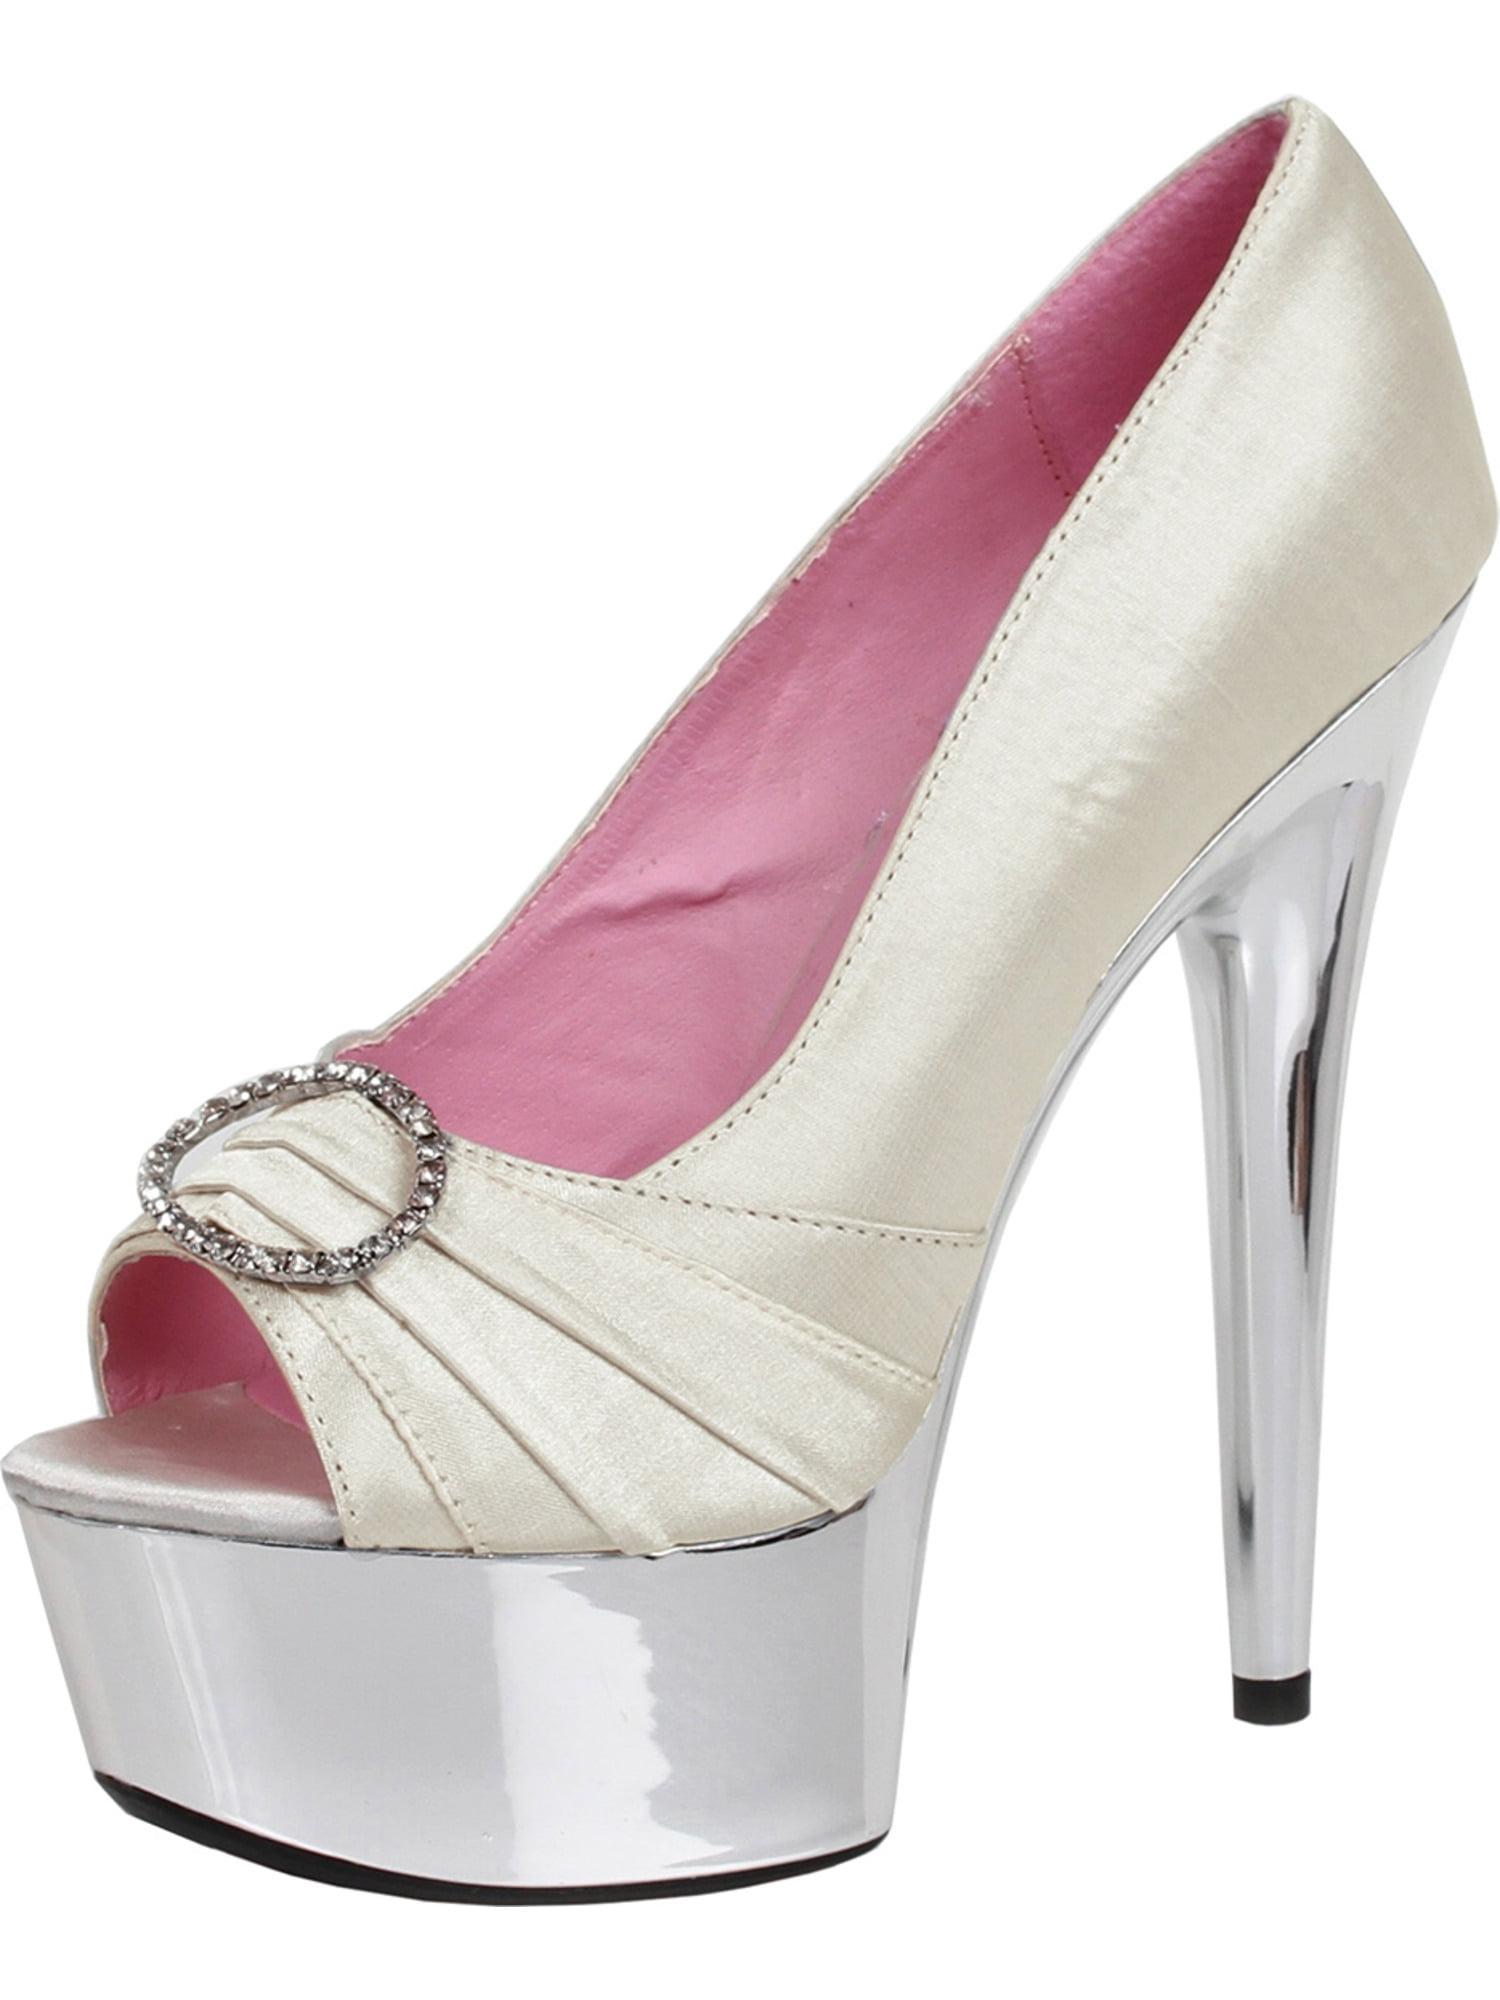 Women's Satin Open 6 Inch Stiletto Heel Open Satin Toe Pump Shoes Rhinestone Buckle Nude 252be7